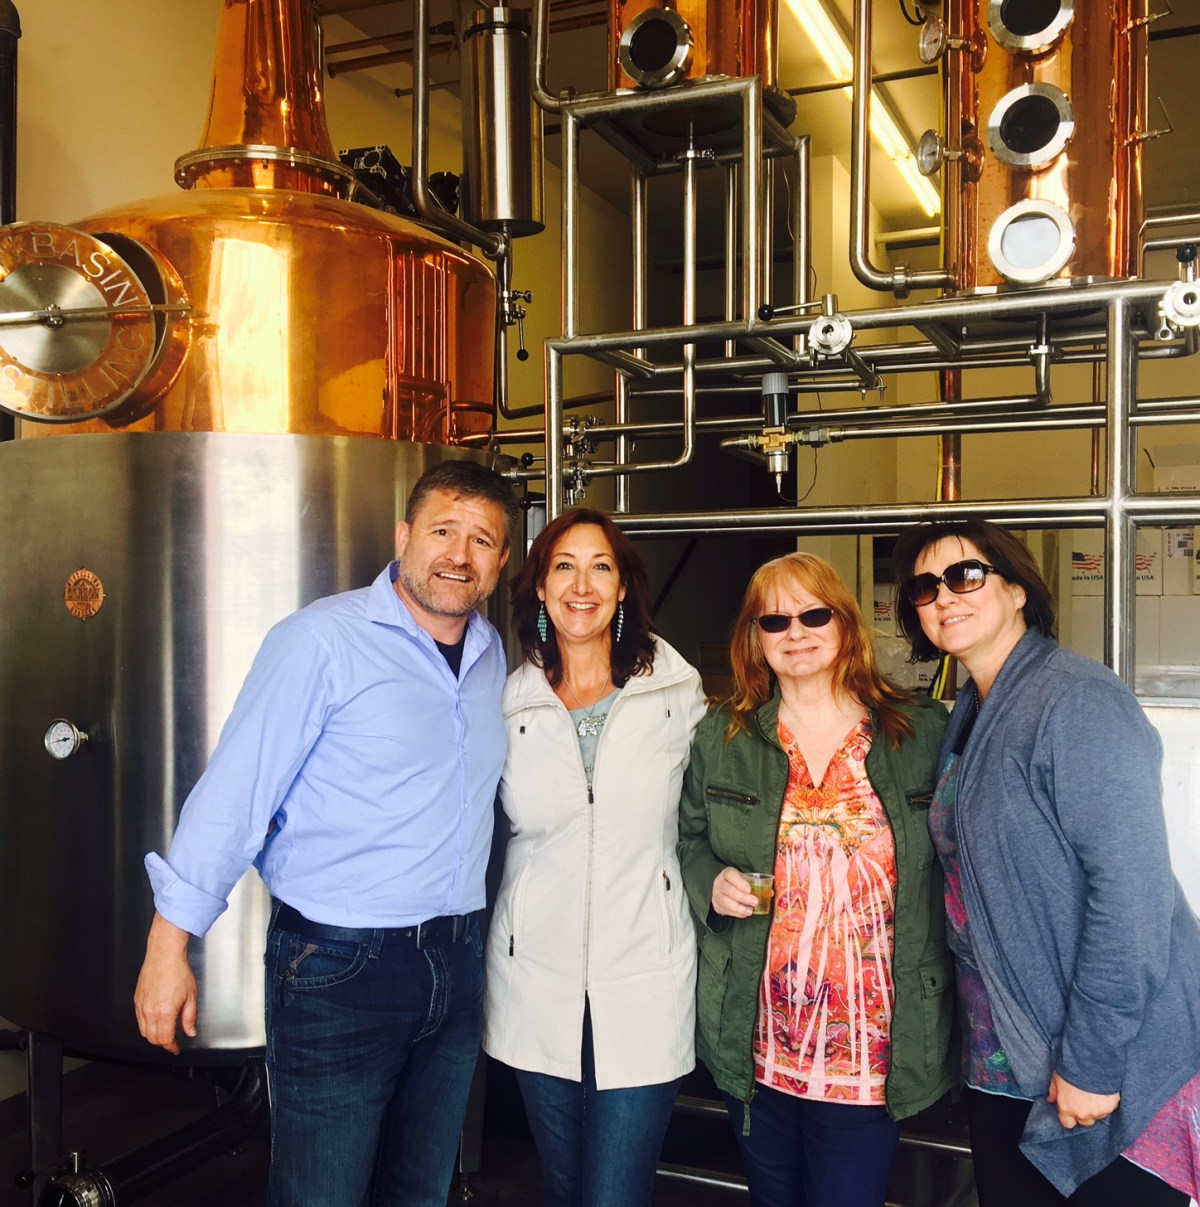 Rick Molitor, me, Susan and Yvonne at New Basin Distilling